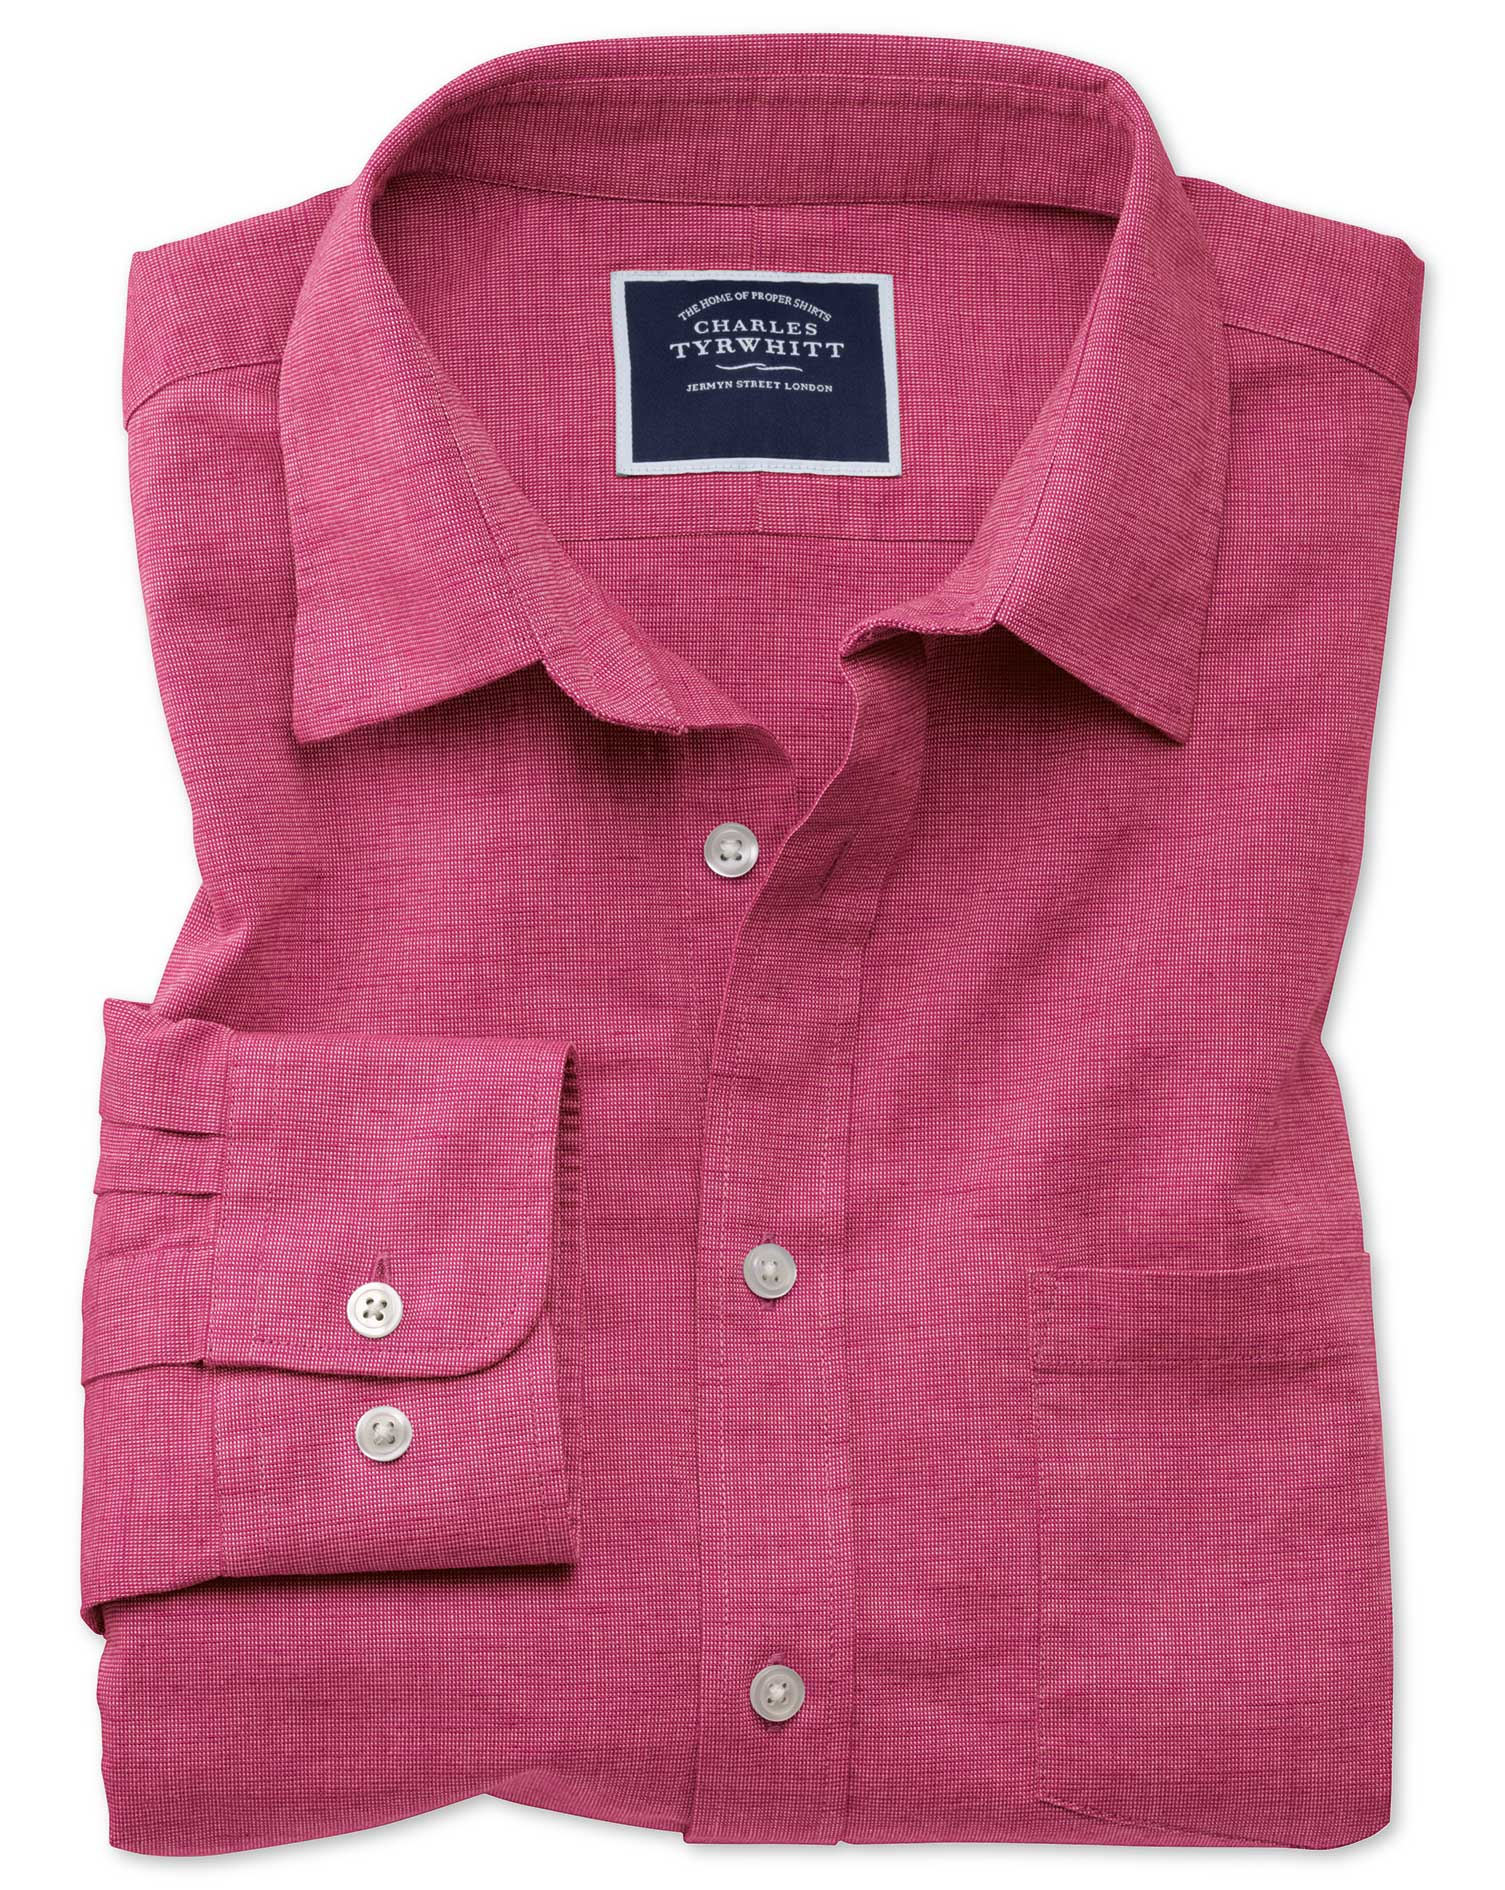 Slim Fit Cotton Linen Bright Pink Plain Shirt Single Cuff Size Medium by Charles Tyrwhitt